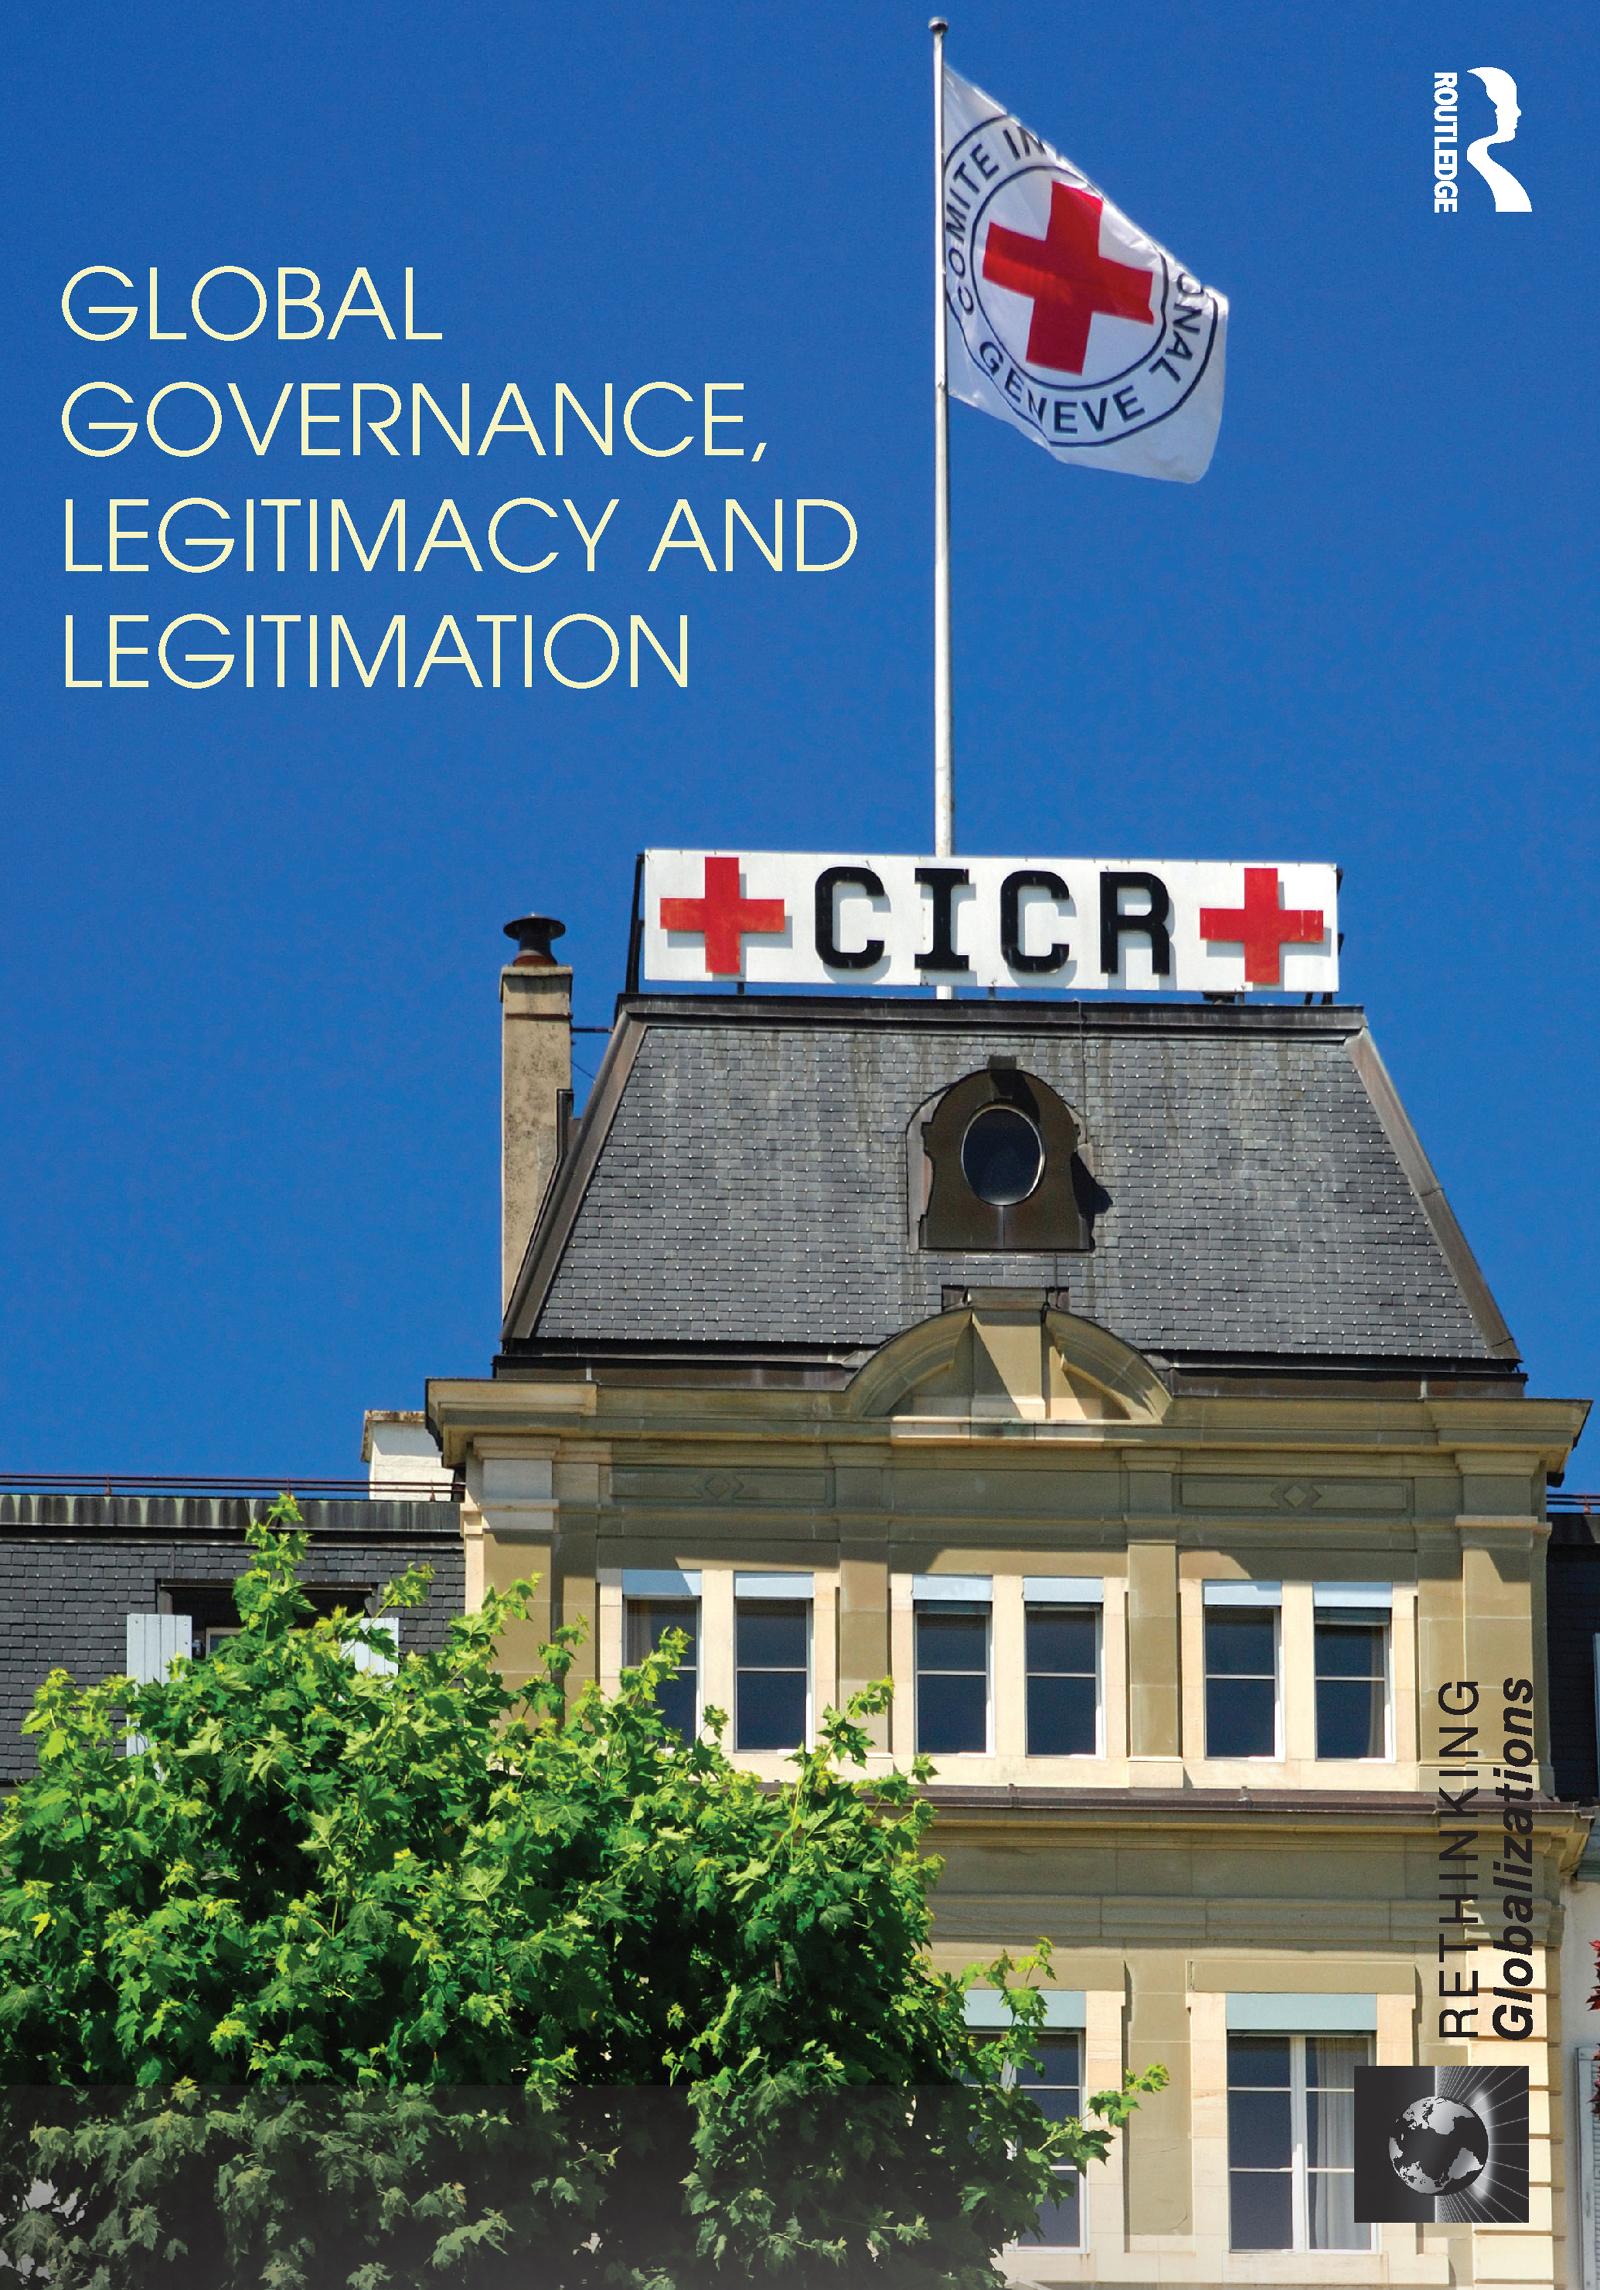 Global Governance, Legitimacy and Legitimation